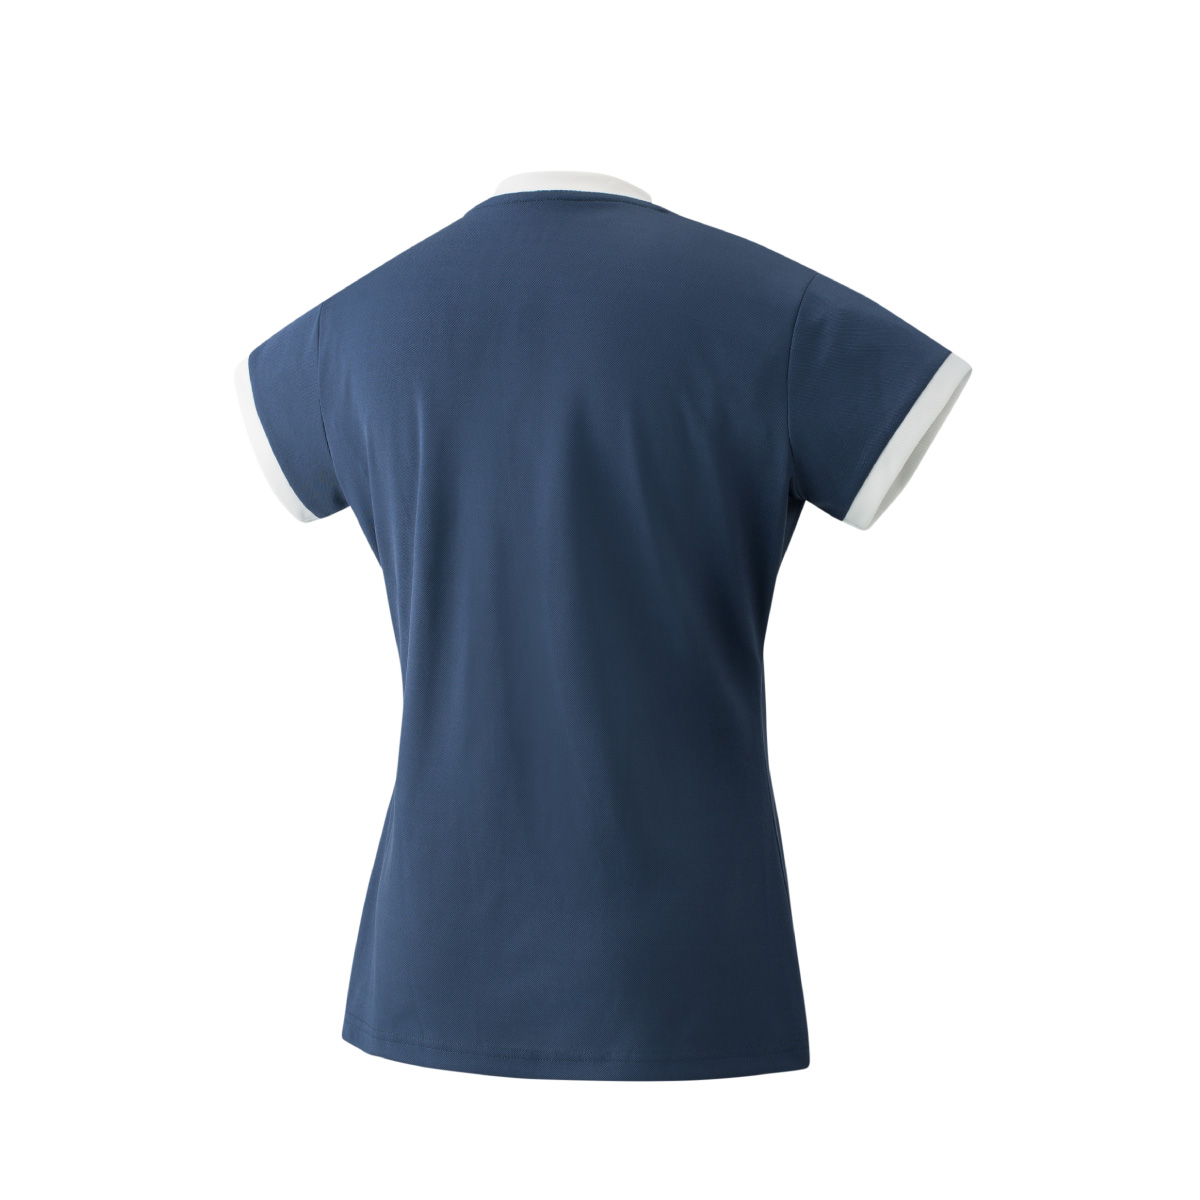 Women's Polo ShirtDetailbild - 1